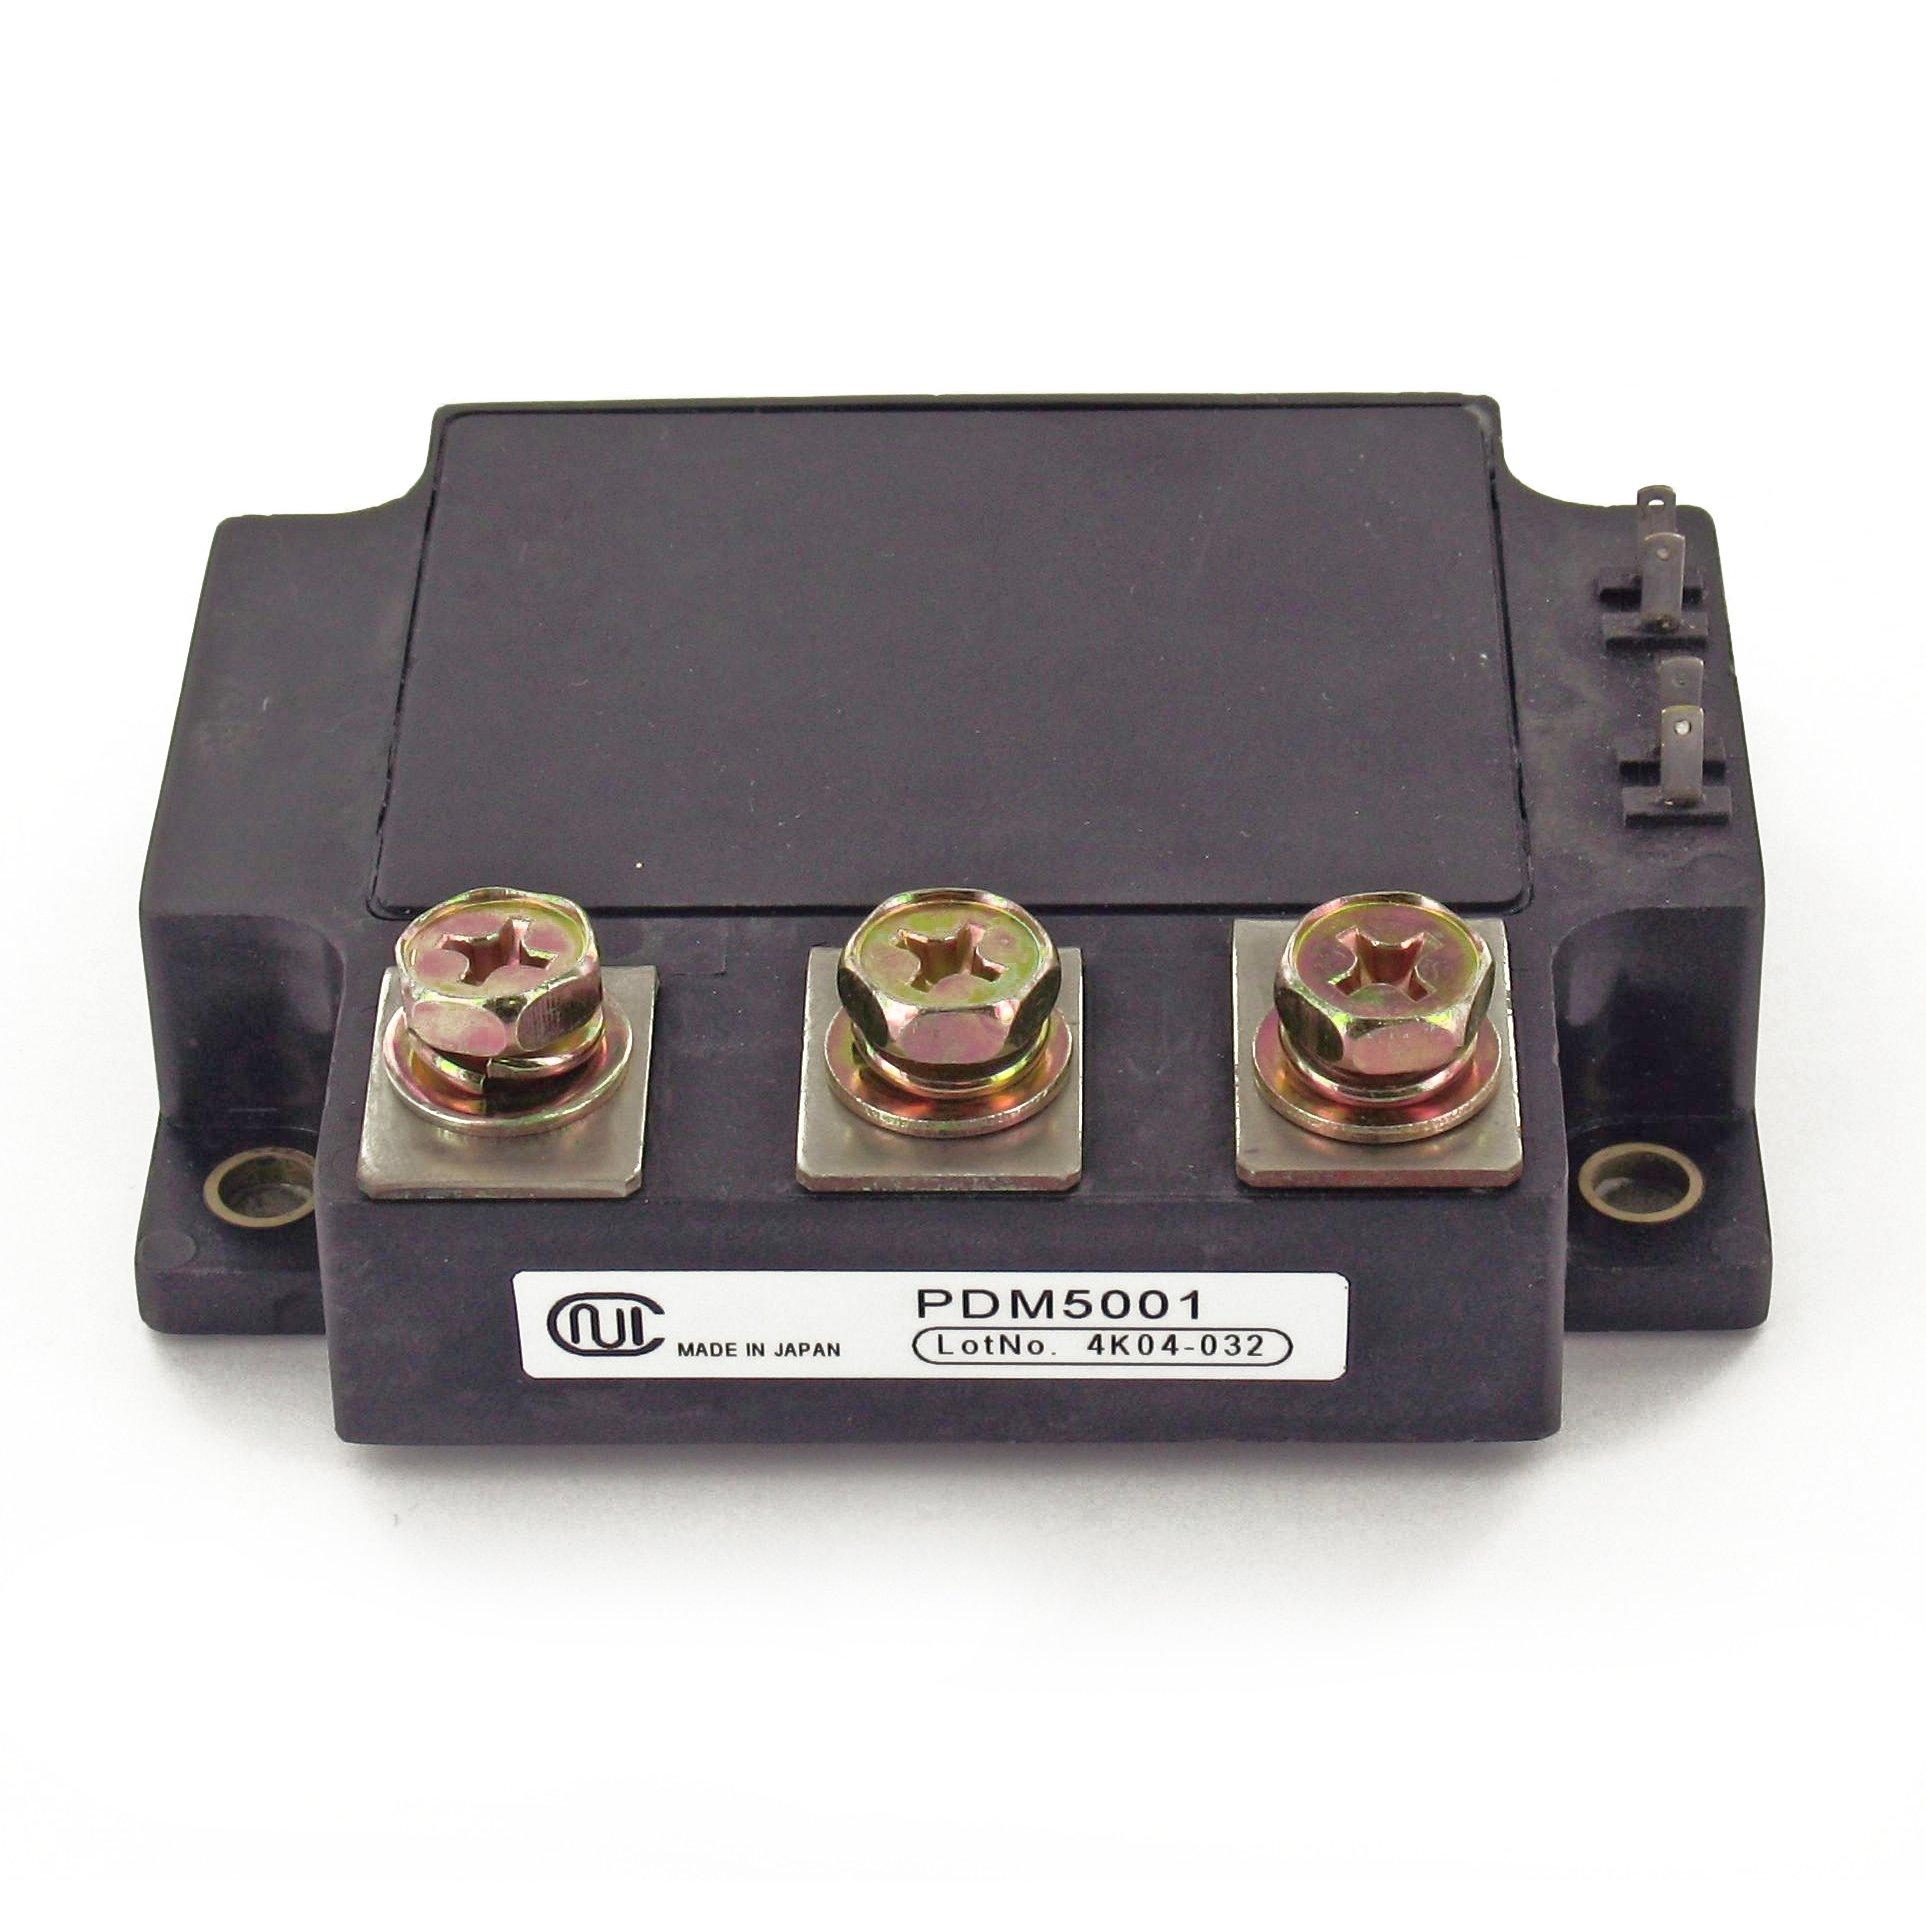 NIEC PDM5001 MOSFET Chopper Power Transistor Module